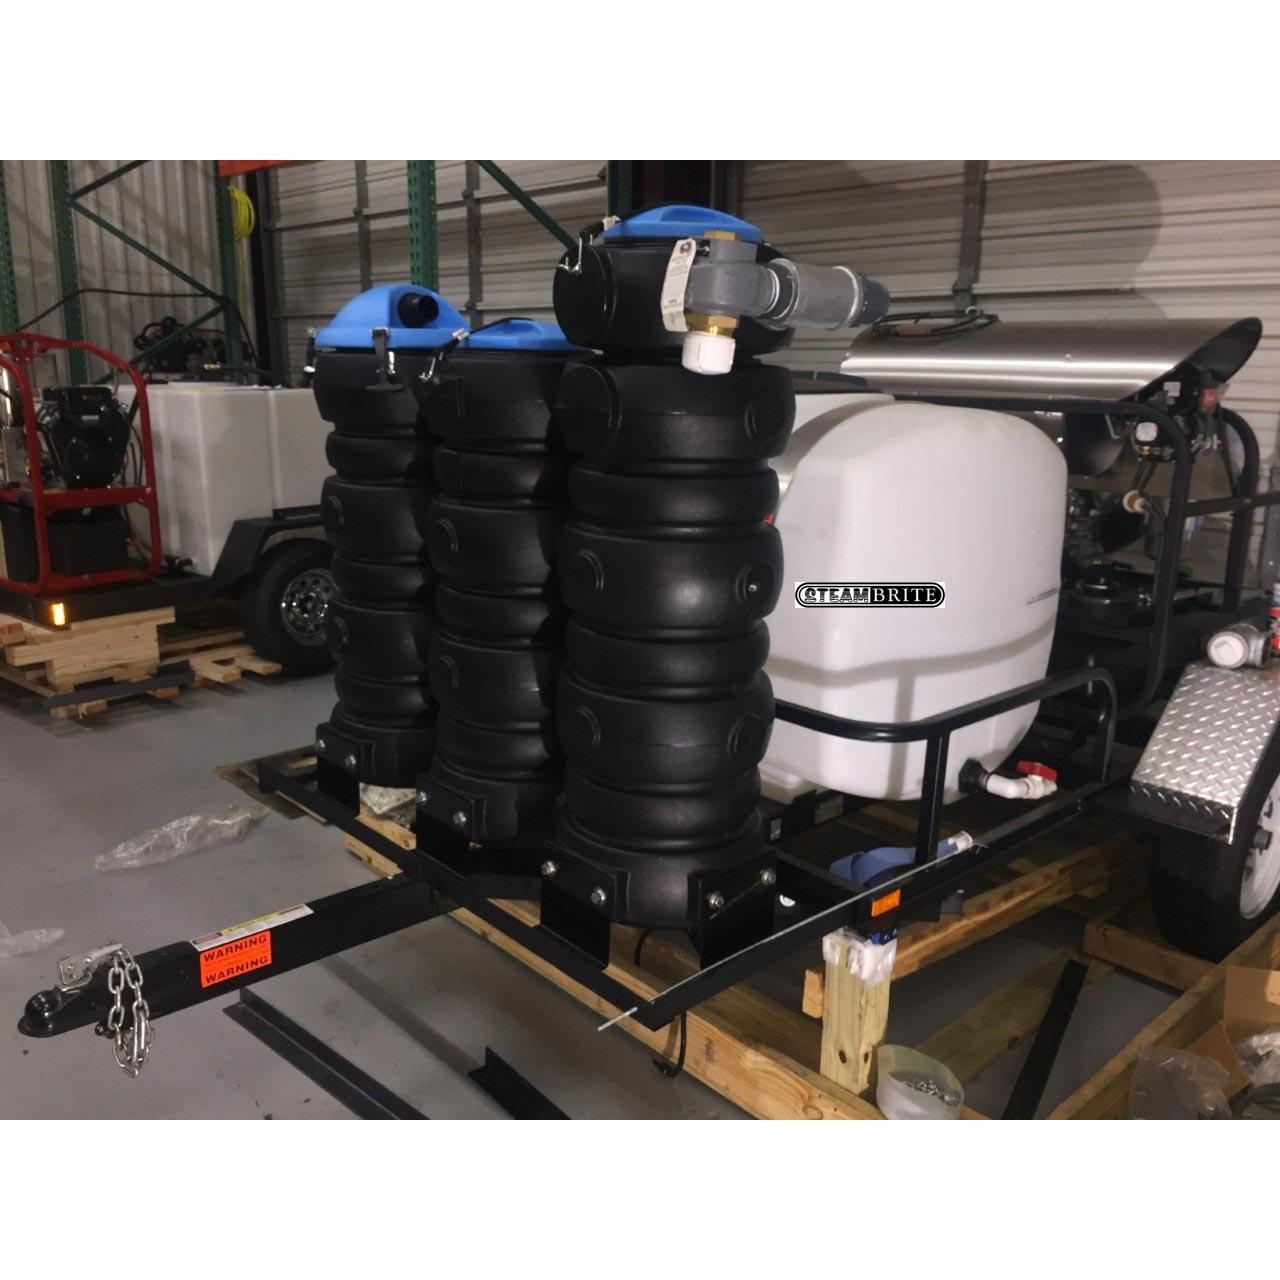 Trailermount Truckmount 35 Hp 4000 Psi 5 Gpm Ar Pump Hot